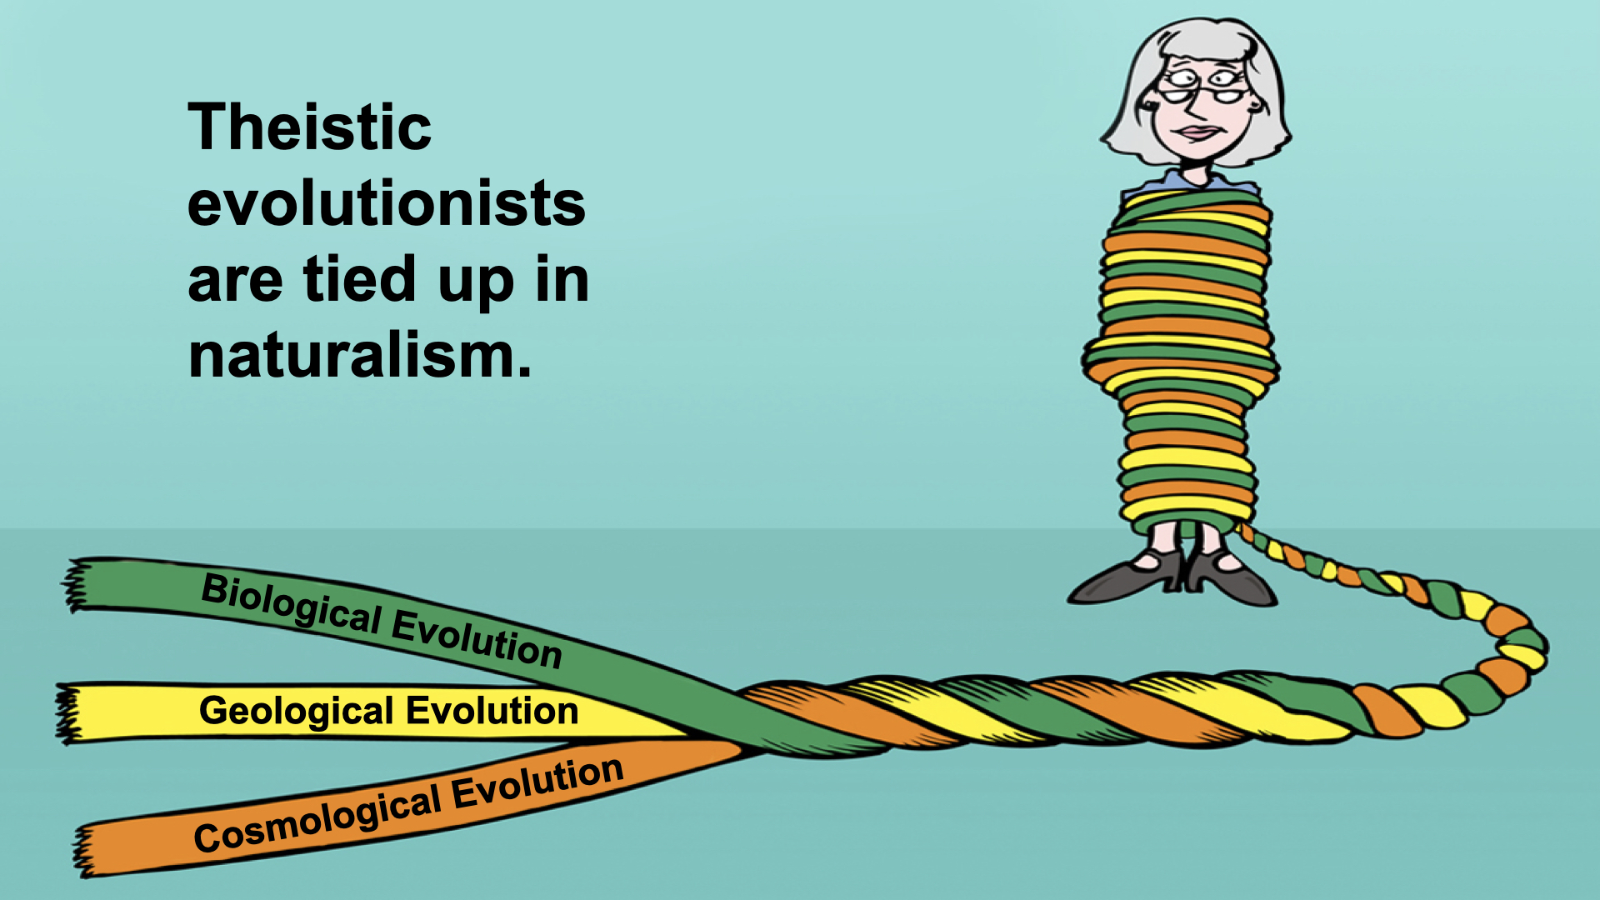 Theistic evolutionists